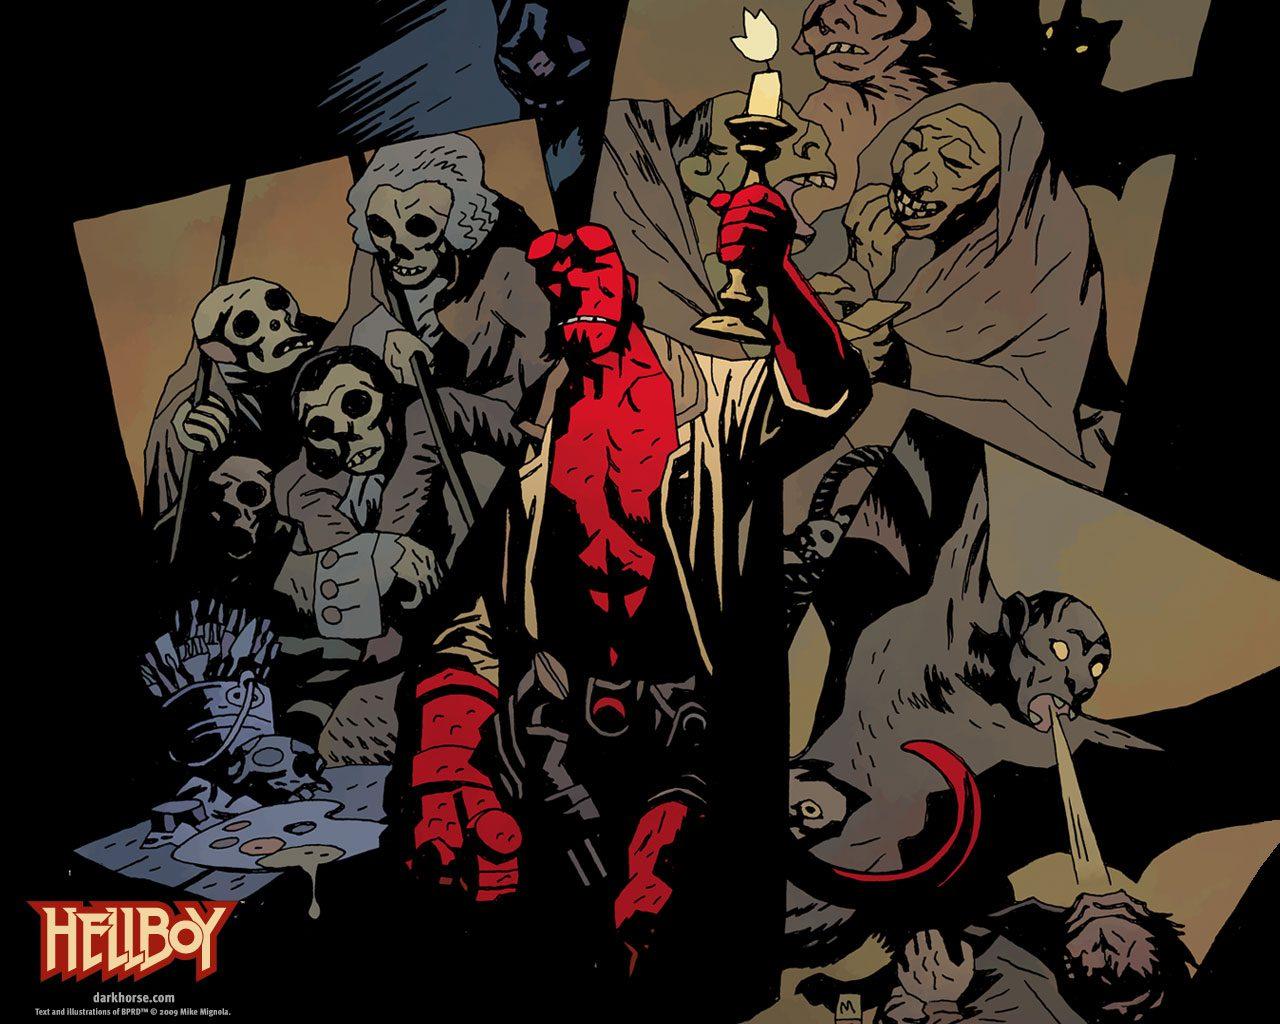 Milla Jovovich Cast as the villain in Hellboy Reboot